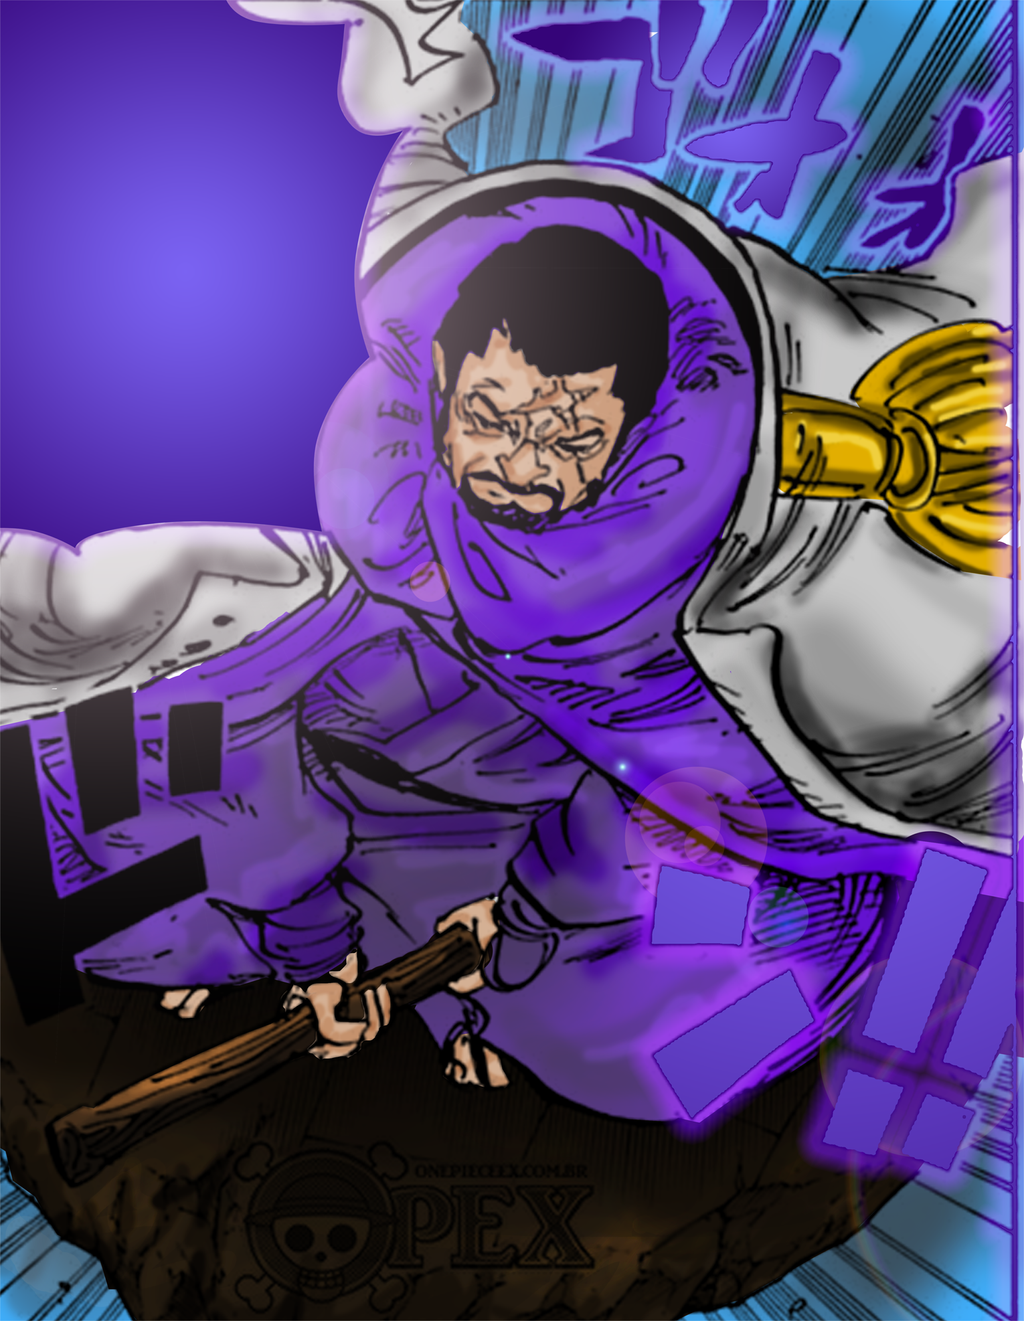 One Piece 797 Fujitora by rafaelconcept on DeviantArt